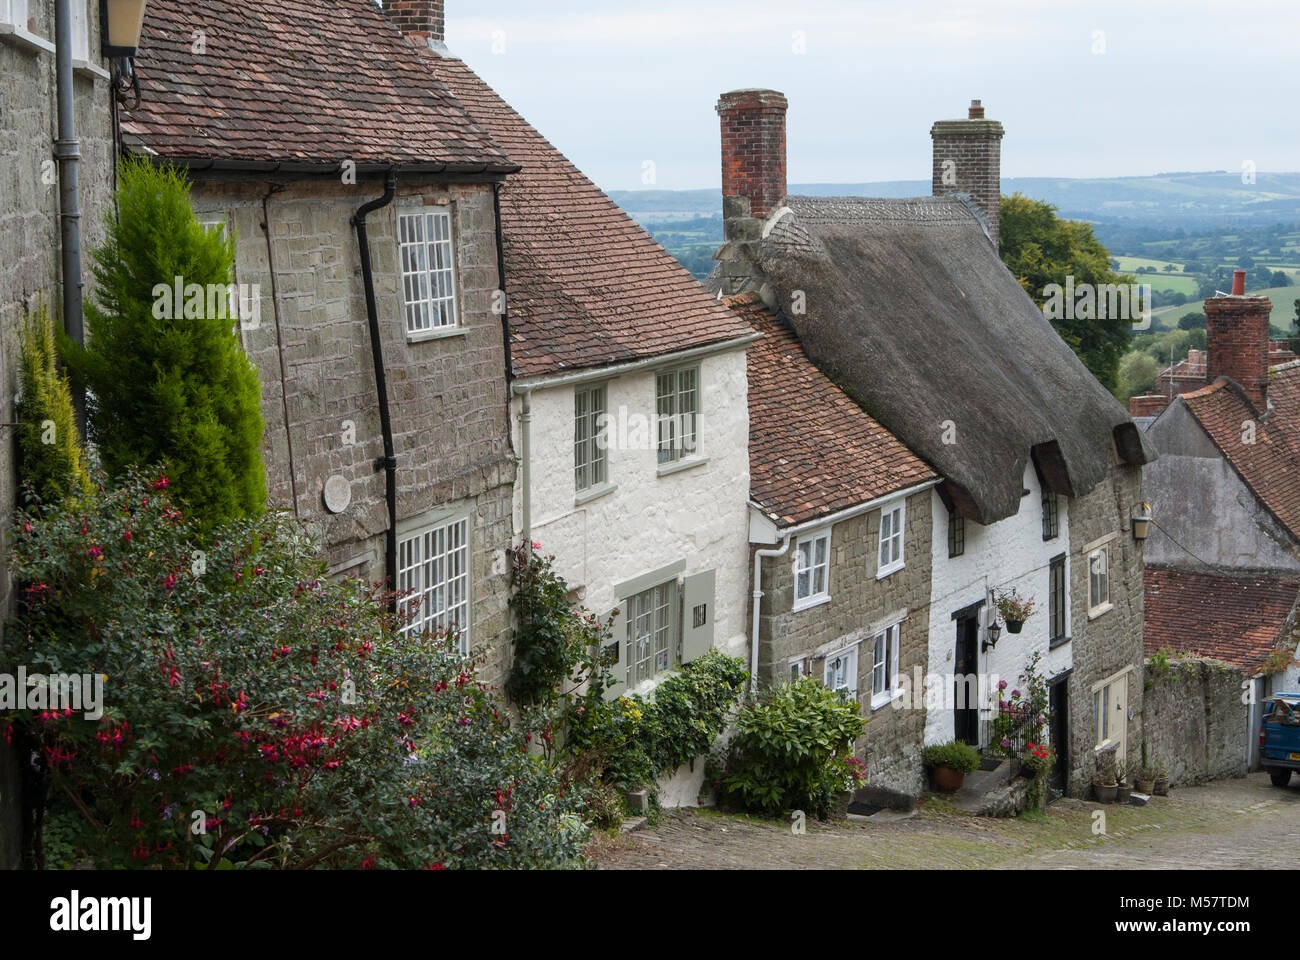 Gold Hill, Shaftsbury, Dorset, England - Stock Image